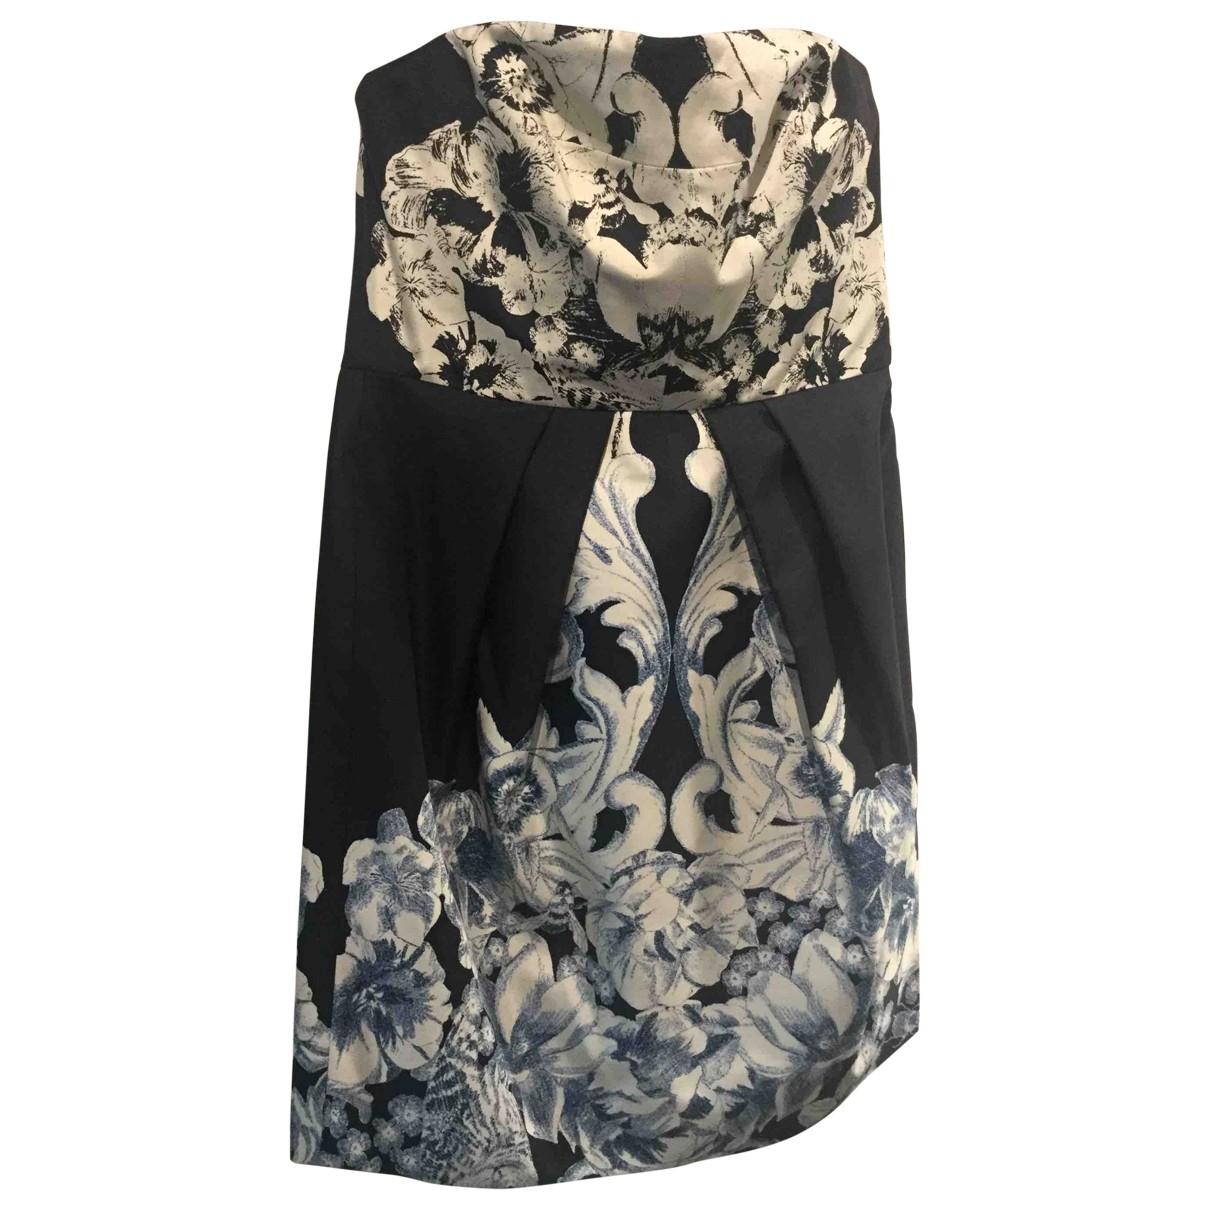 Tibi \N Black Silk dress for Women 4 US